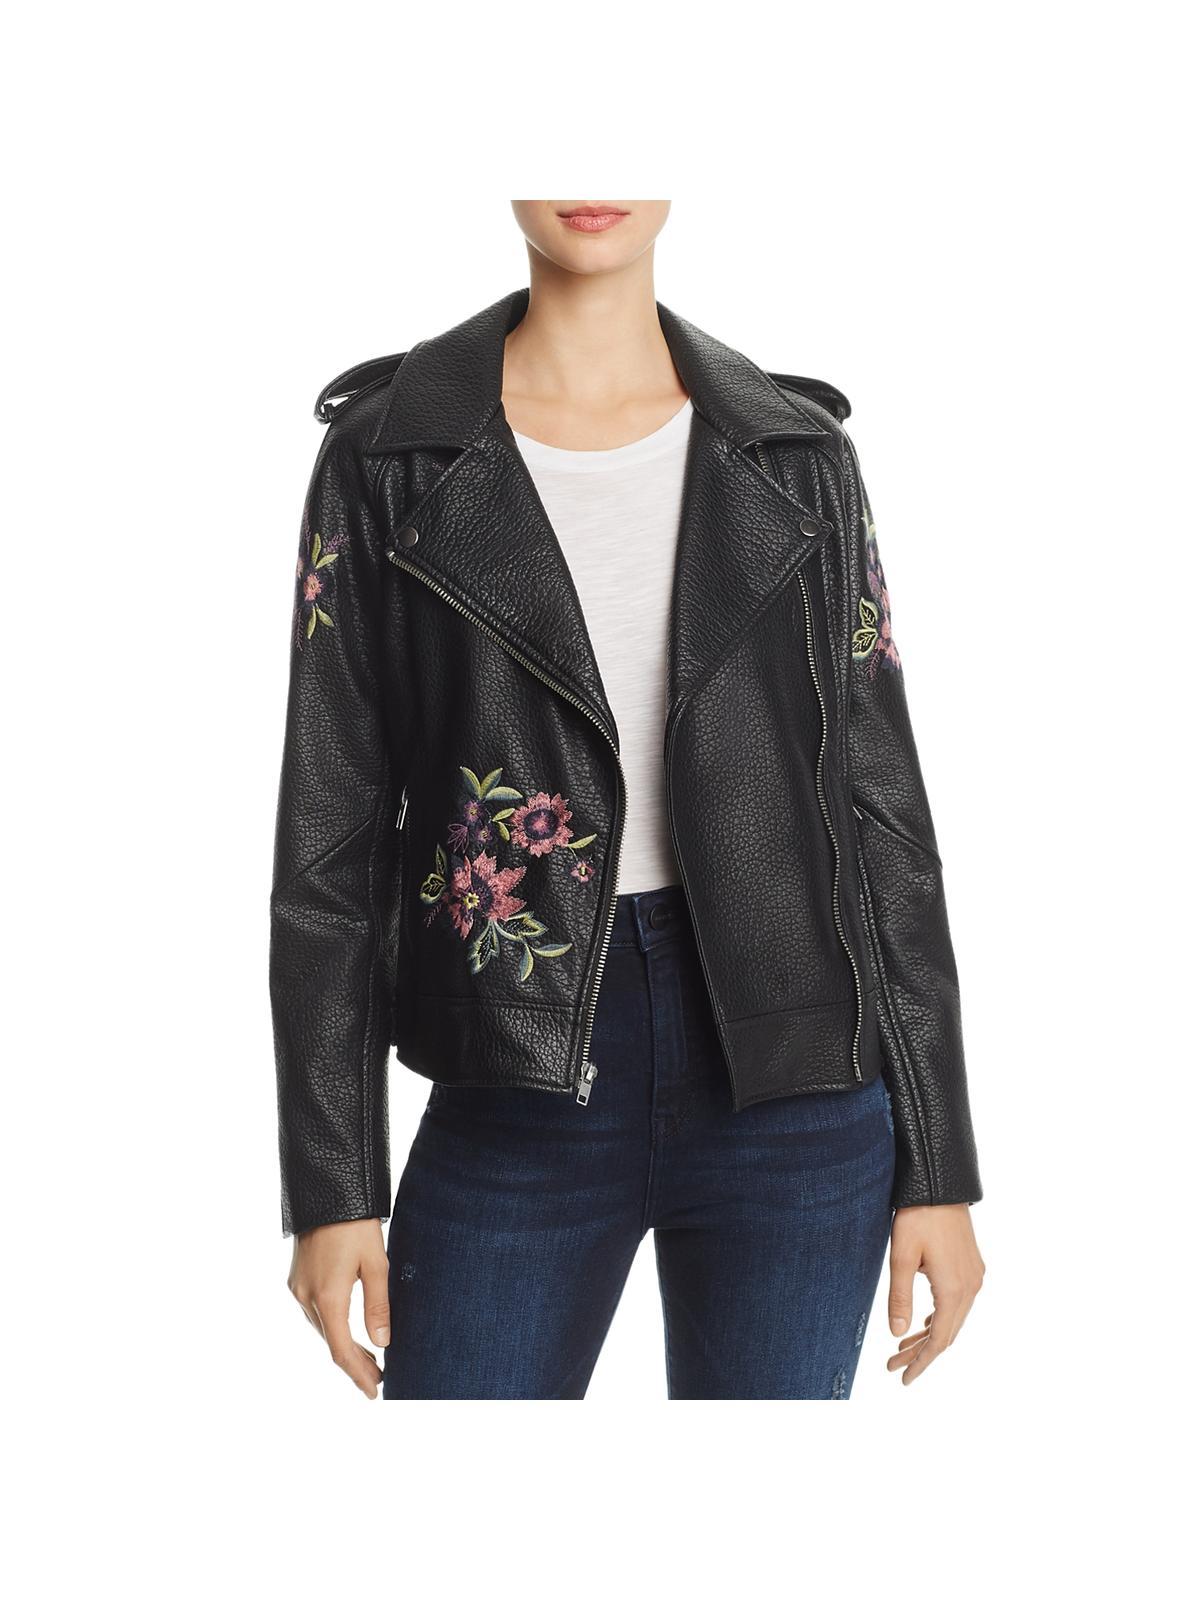 Women Removable Hood HOURGLASS PU Leather Motorcycle Ridin Biker Jacket Size XXL